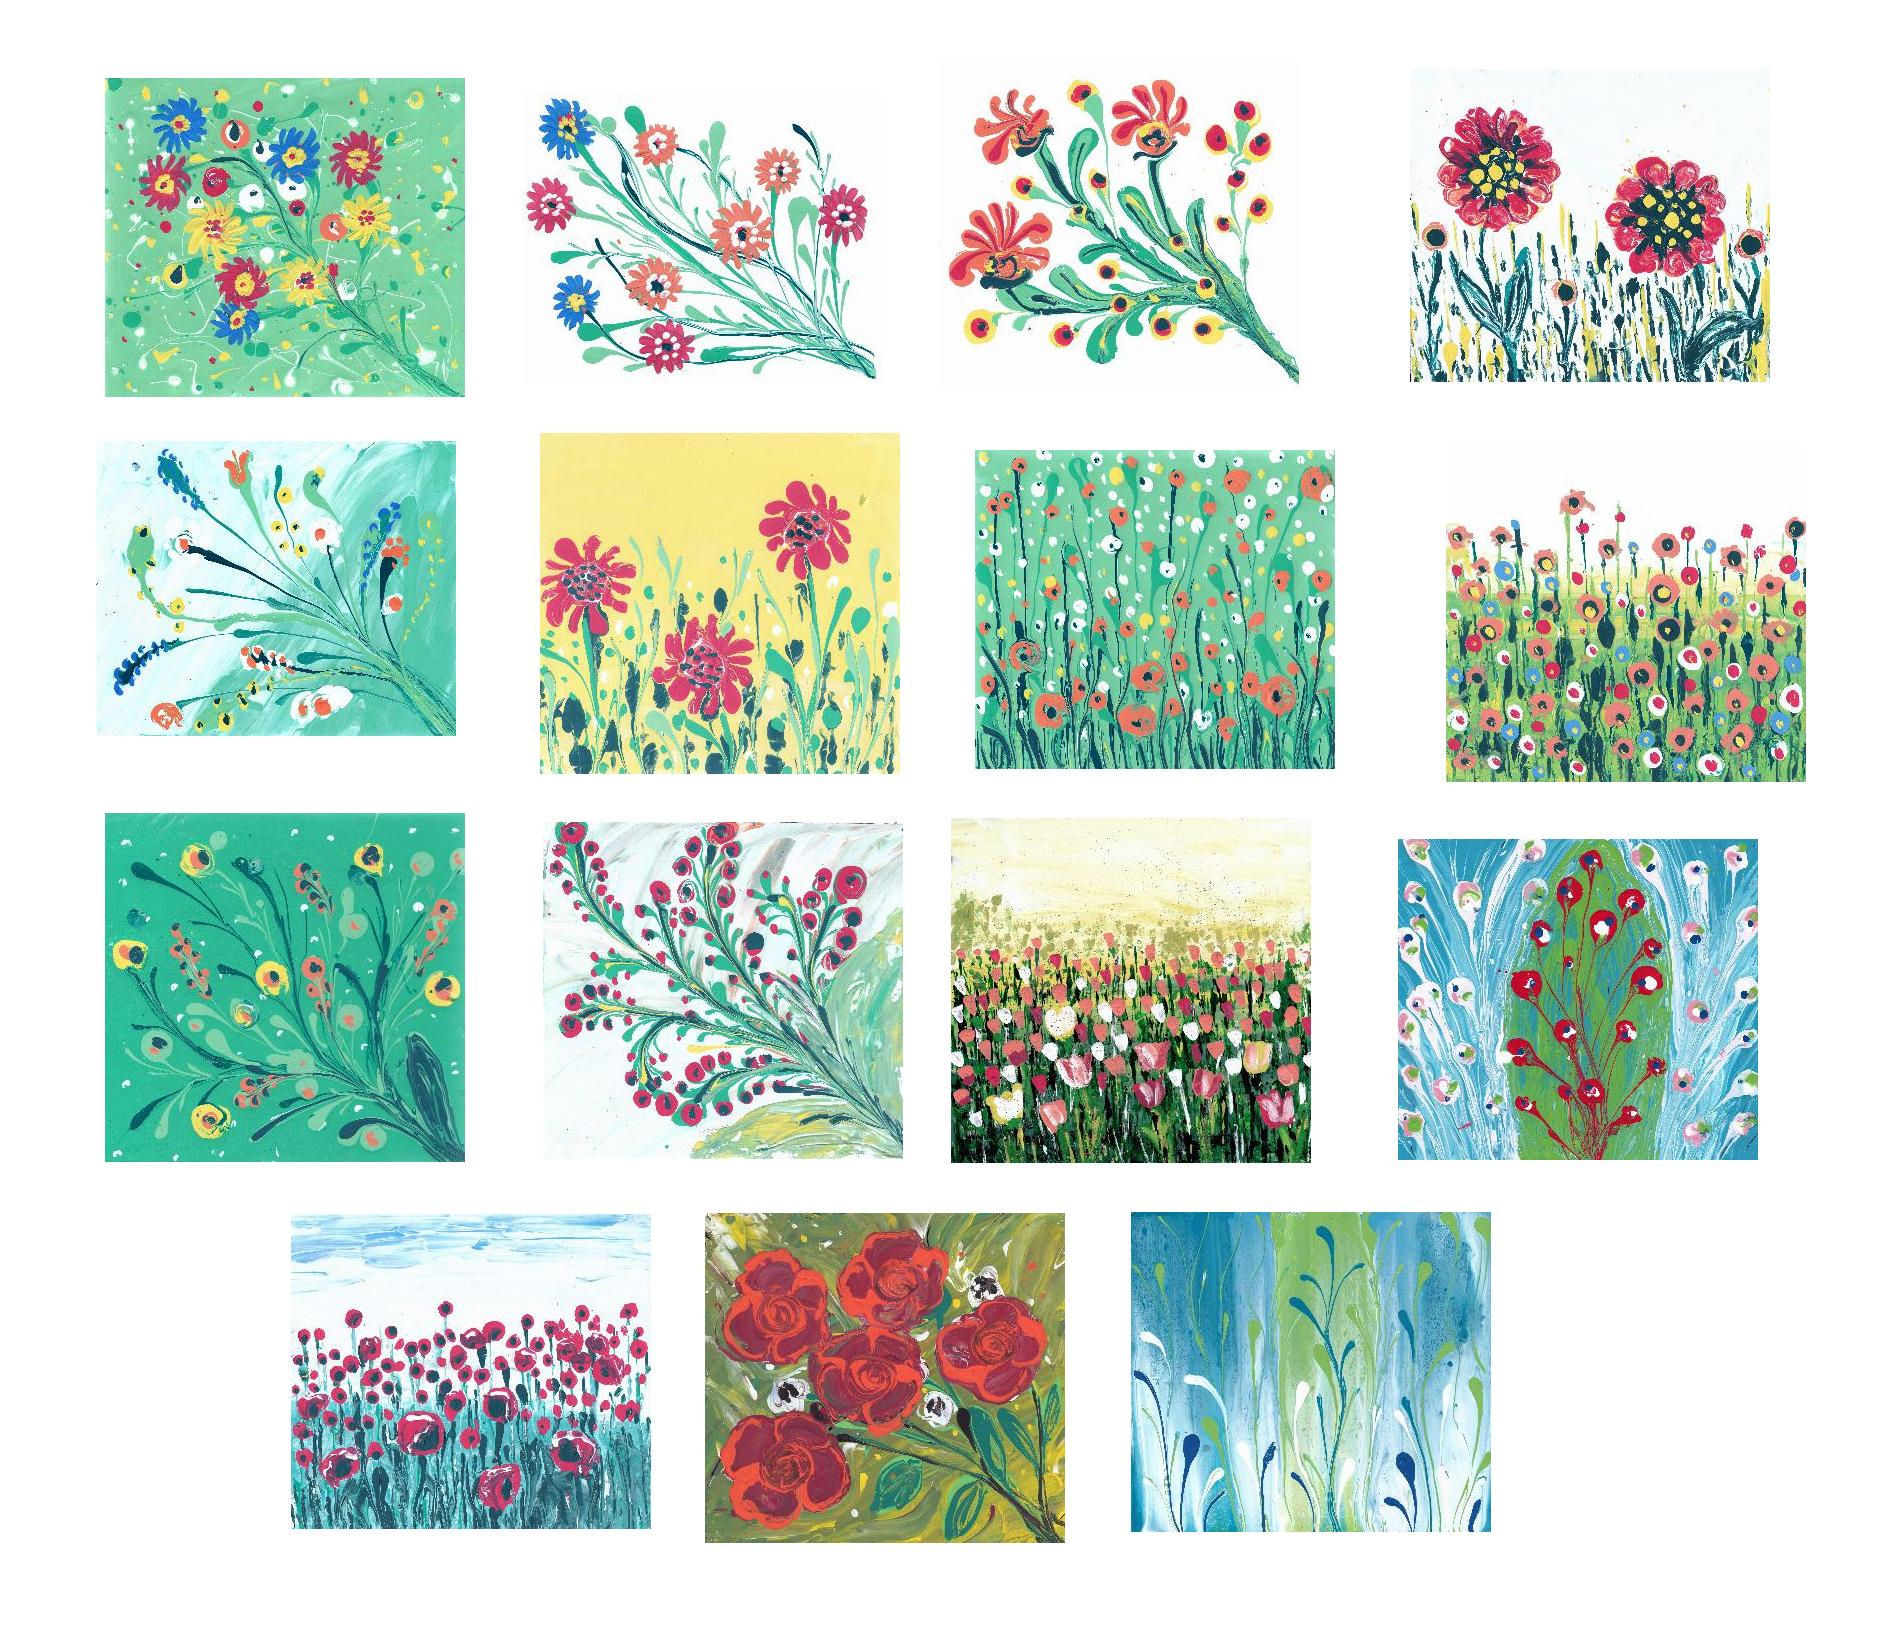 15-flower-marbling-painting-background-cover.jpg